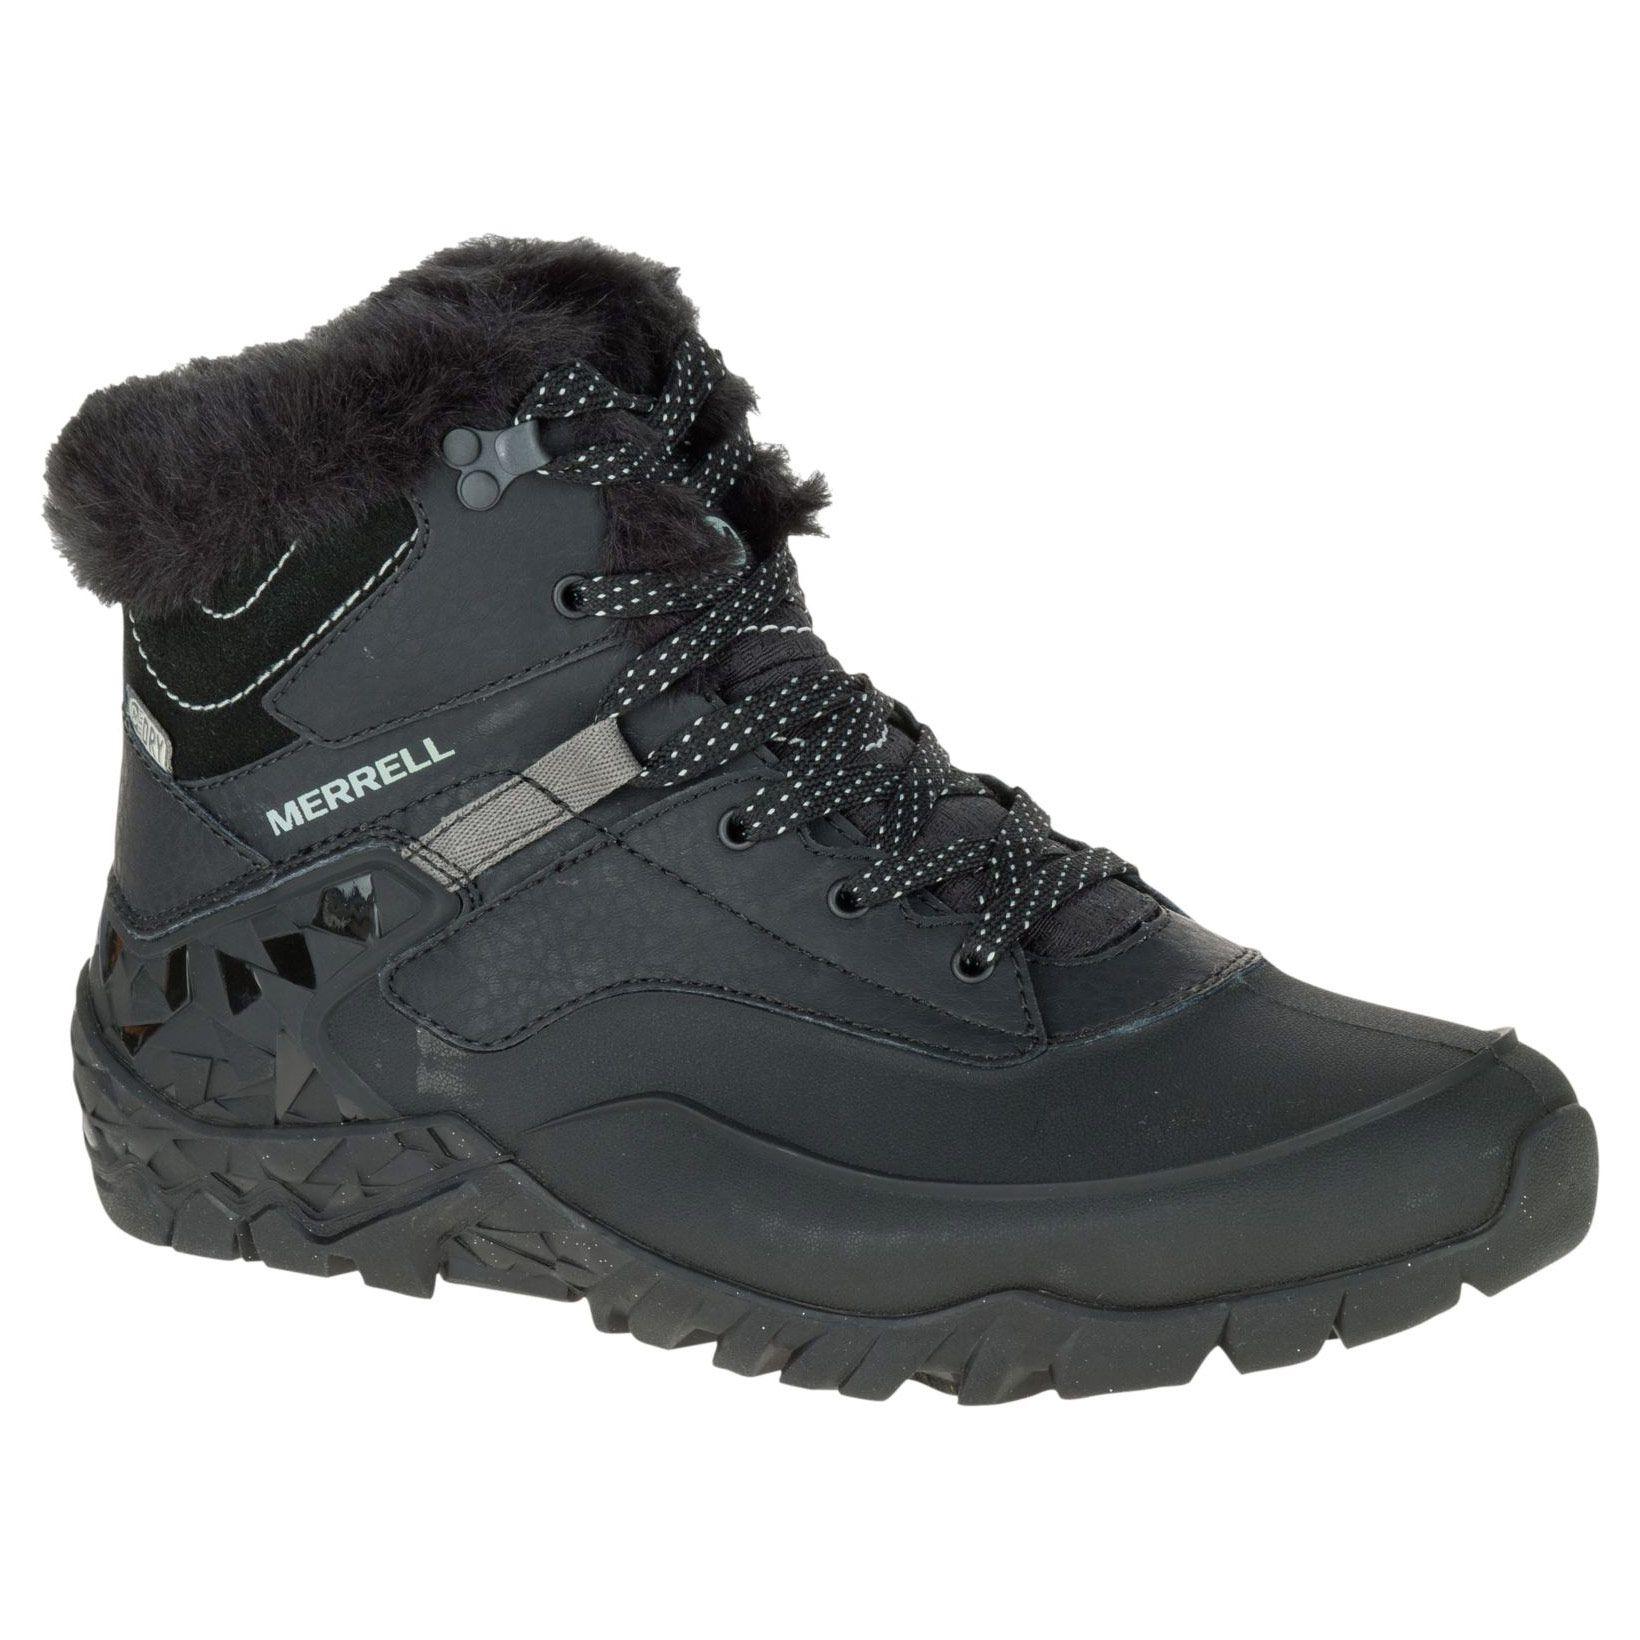 Aurora 6 Ice+ Waterproof Boot - Women's